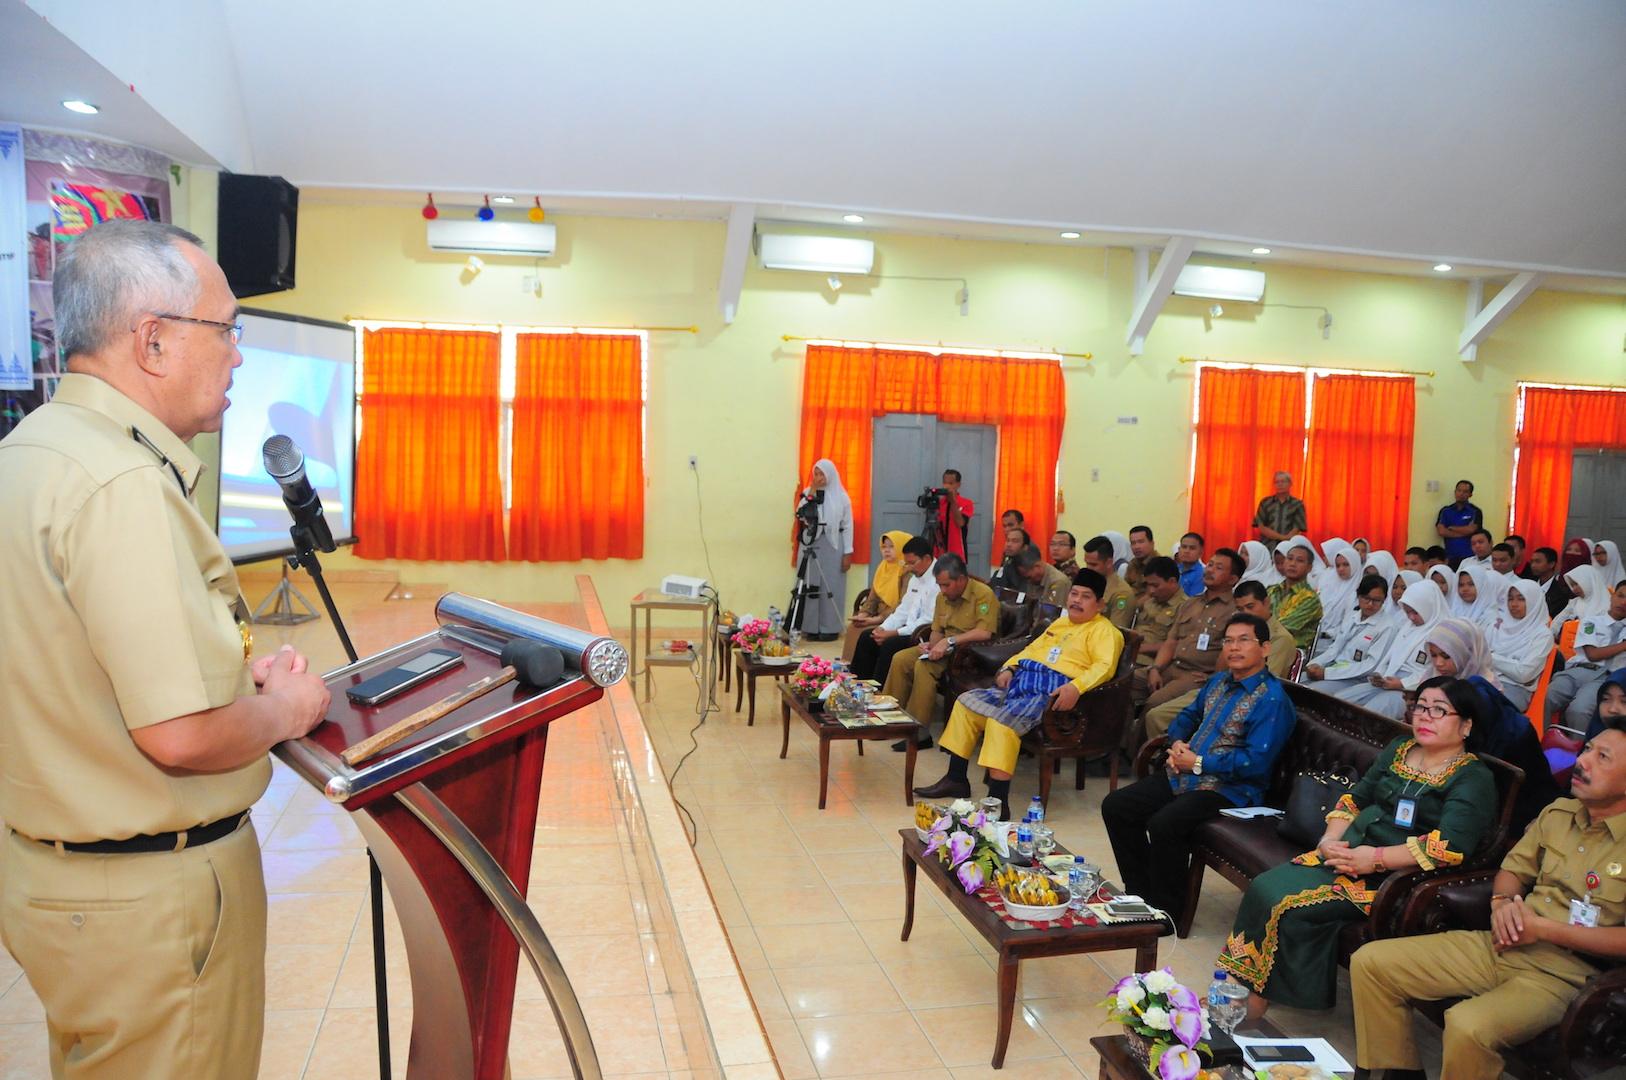 Permalink ke Pembukaan Ekspos/Gebyar SMK Negeri 2 Pekanbaru Menuju SMK Rujukan Tahun 2016